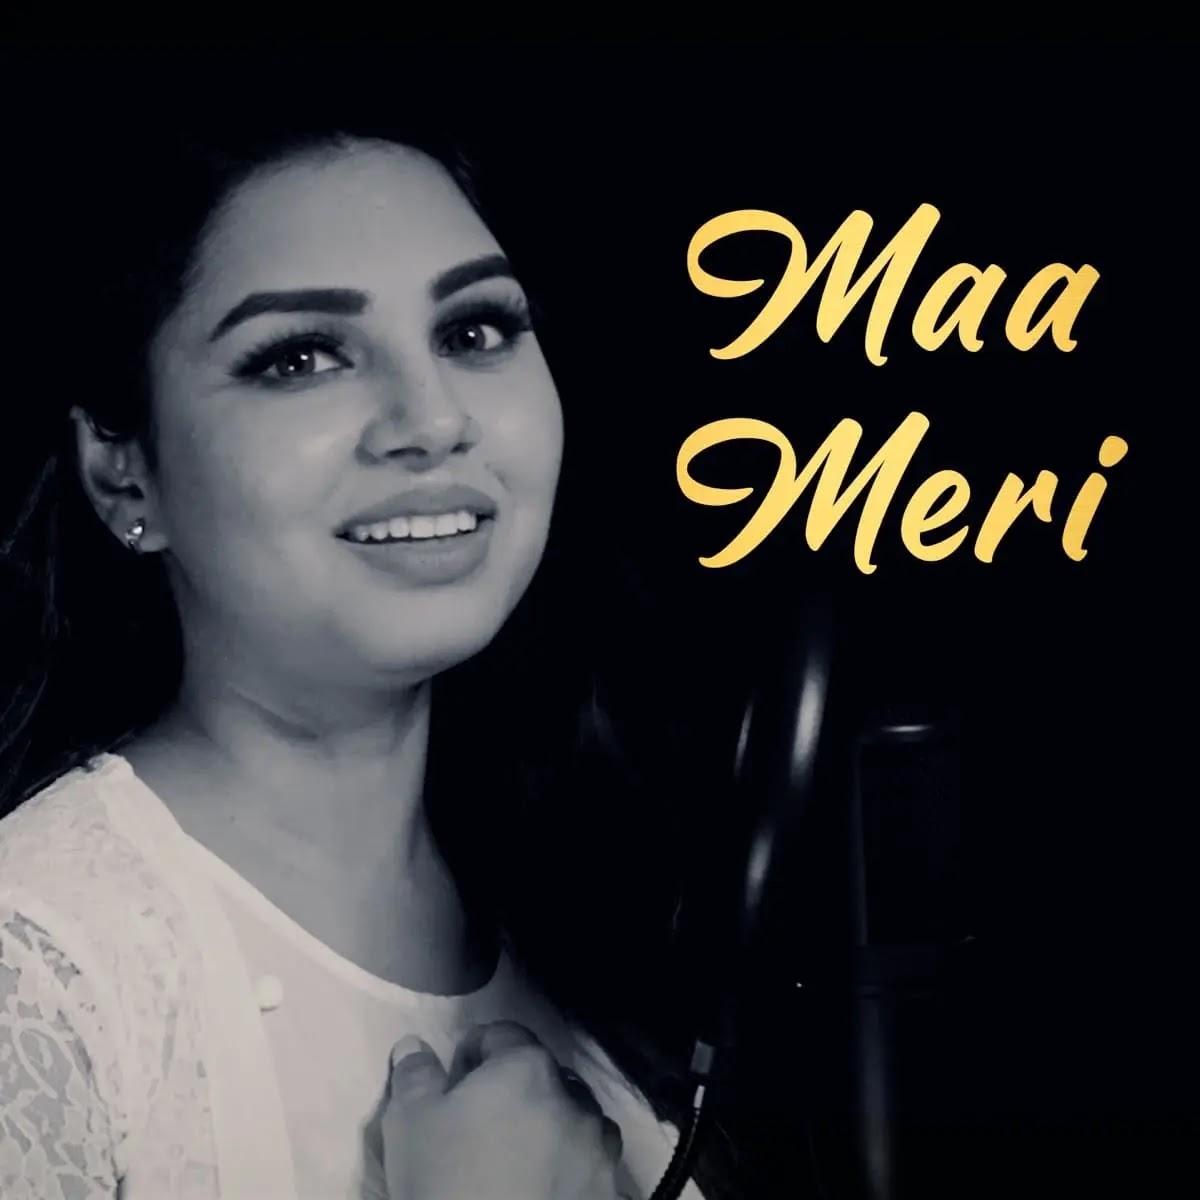 Maa Meri Mp3 Song Download 320kbps Free